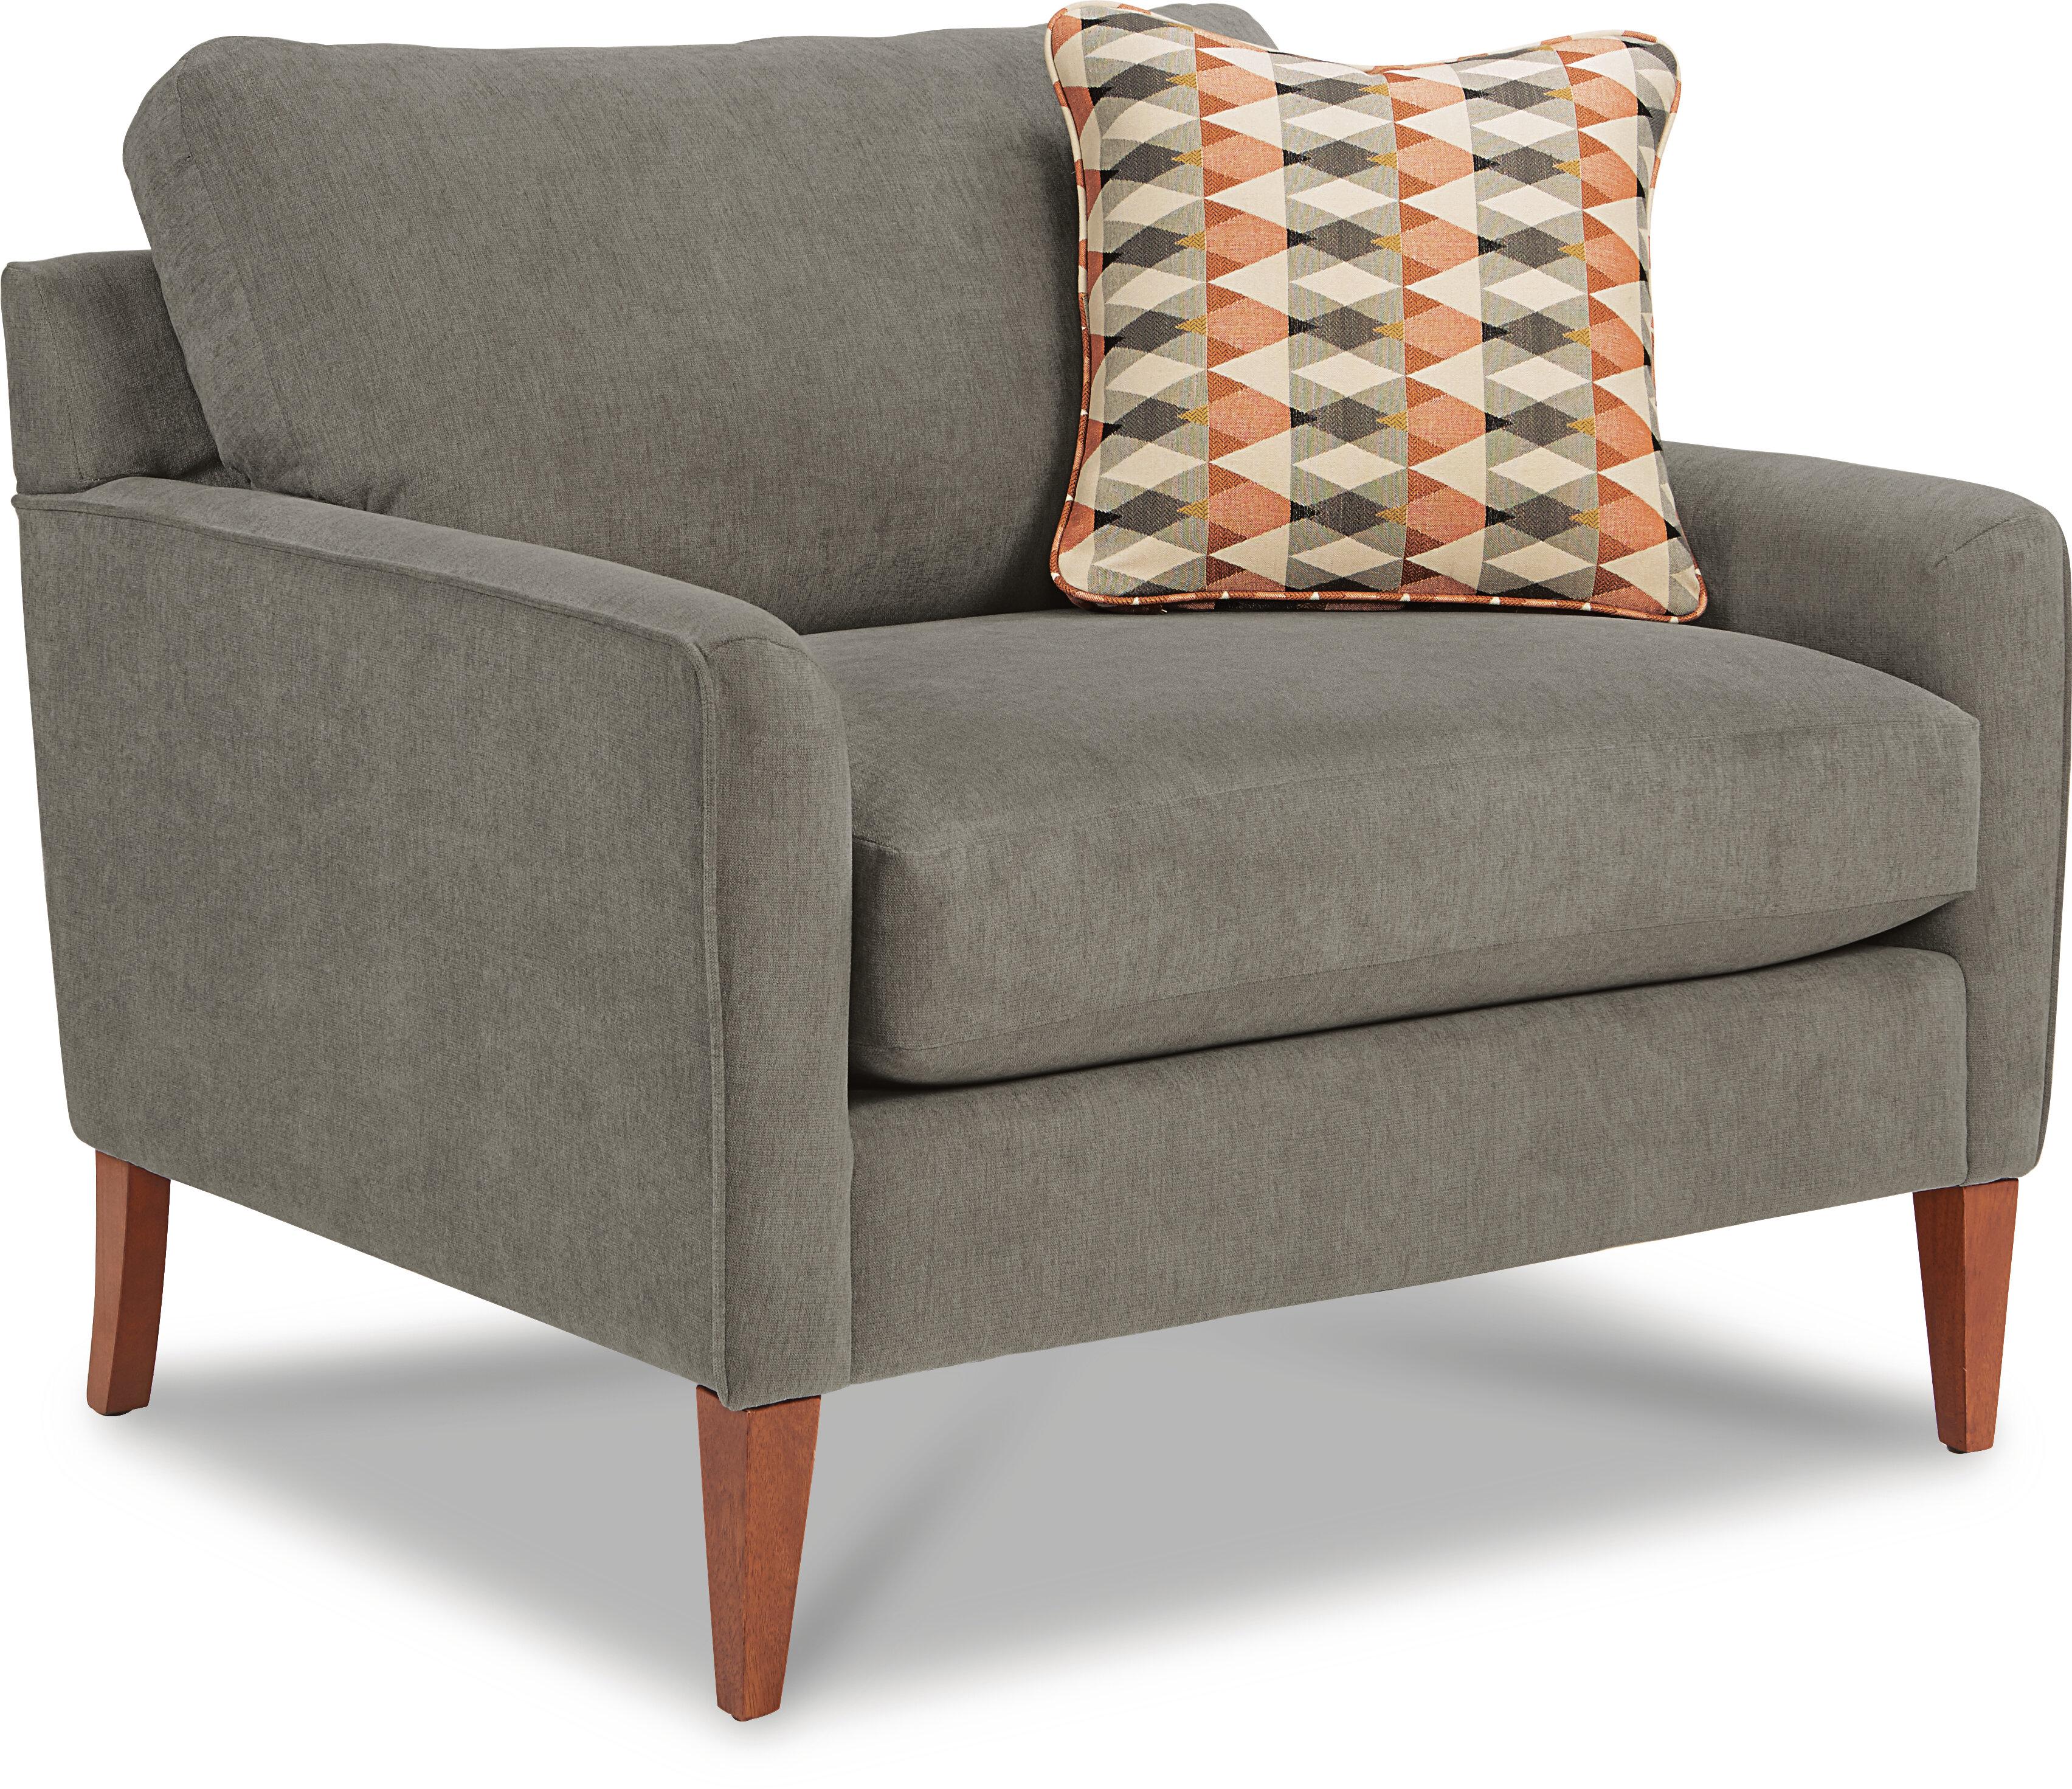 Patio Furniture Mckinney Tx: La-Z-Boy McKinney Chair And A Half